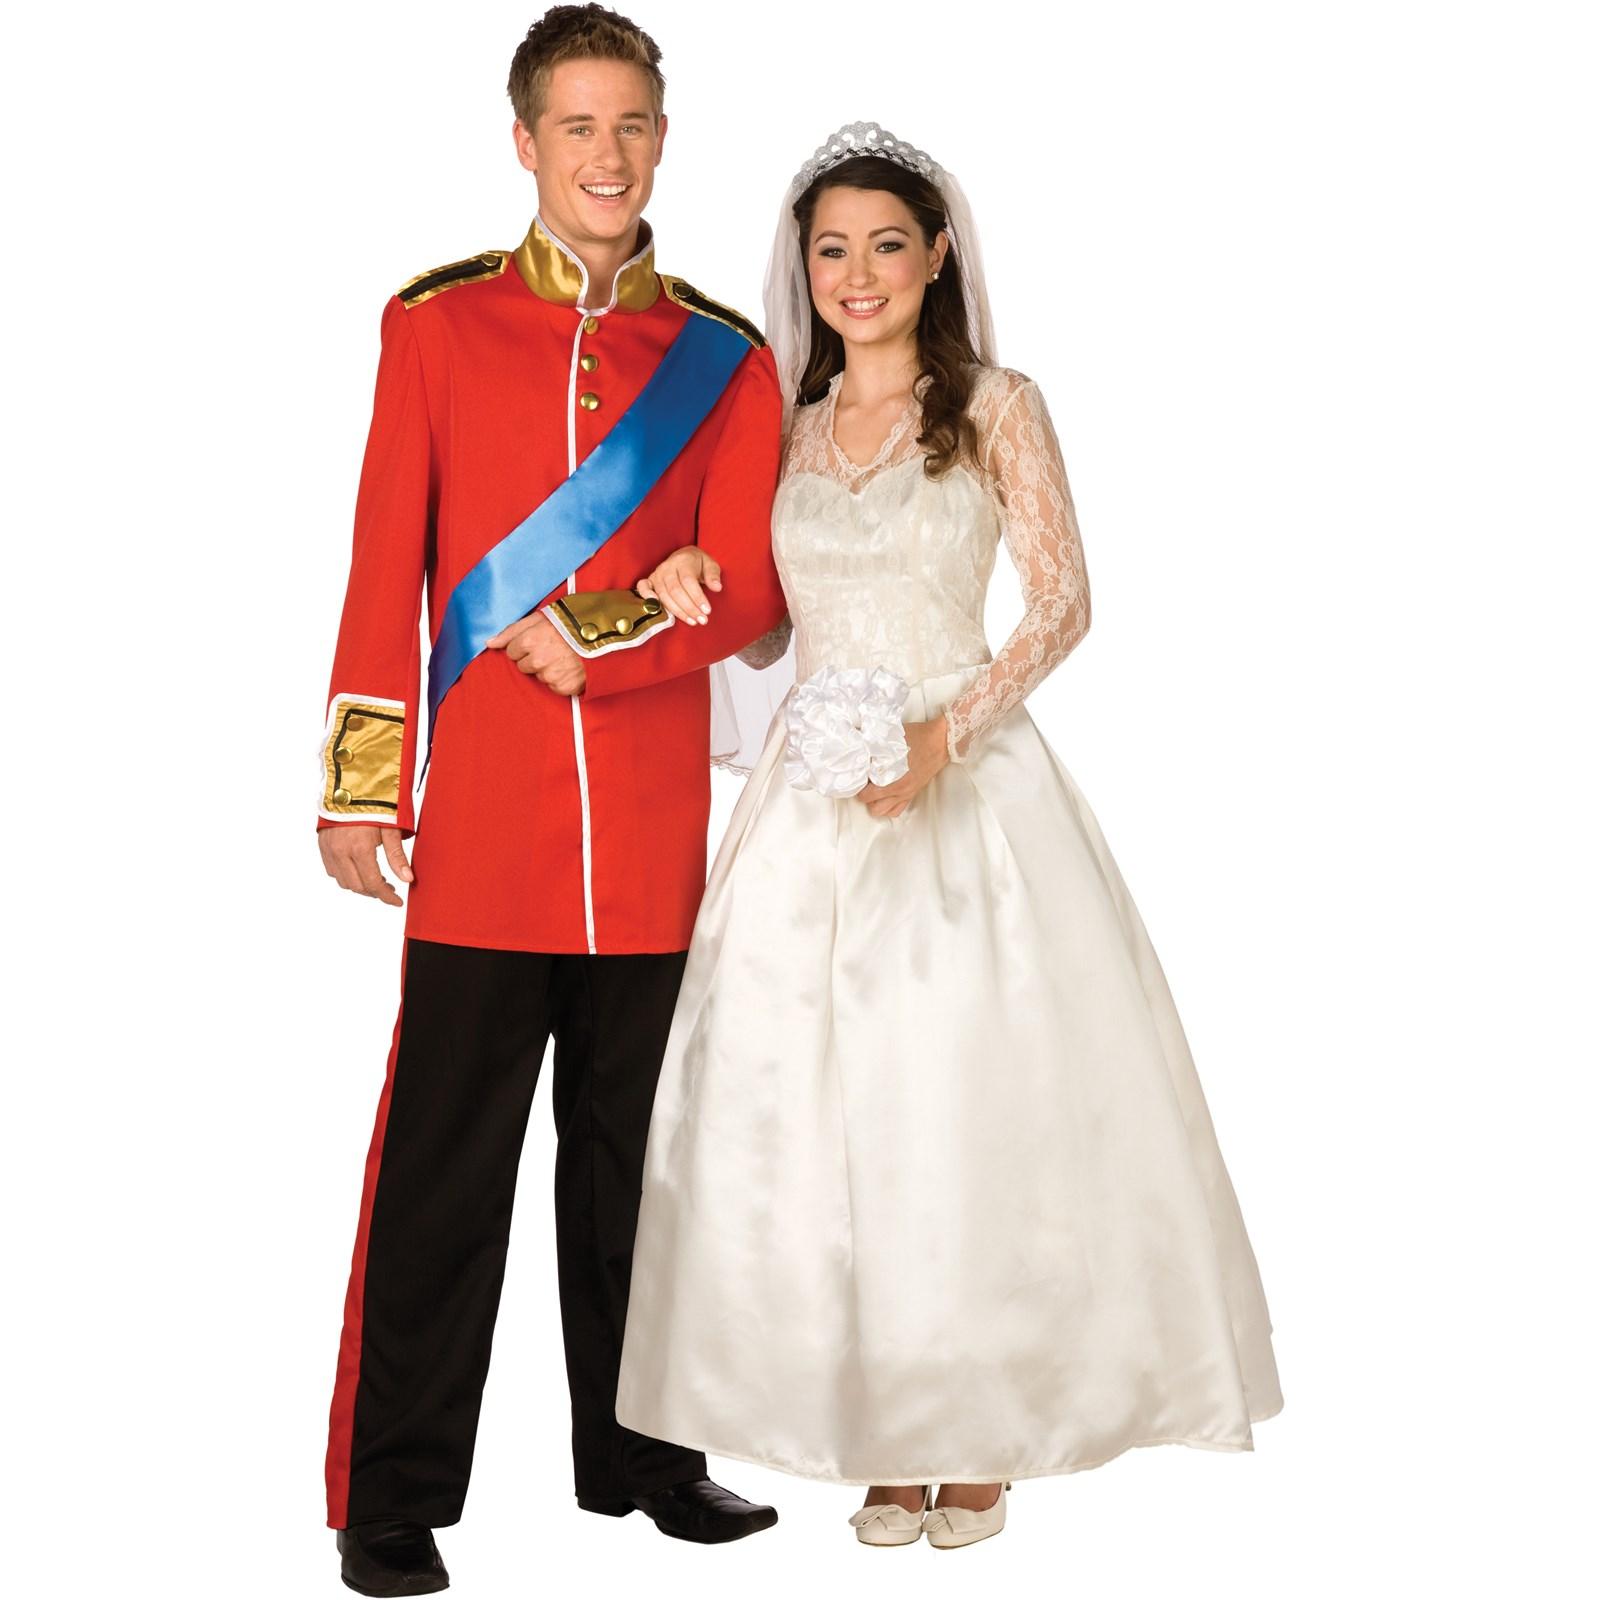 Royal Wedding Uniform Adult Costume